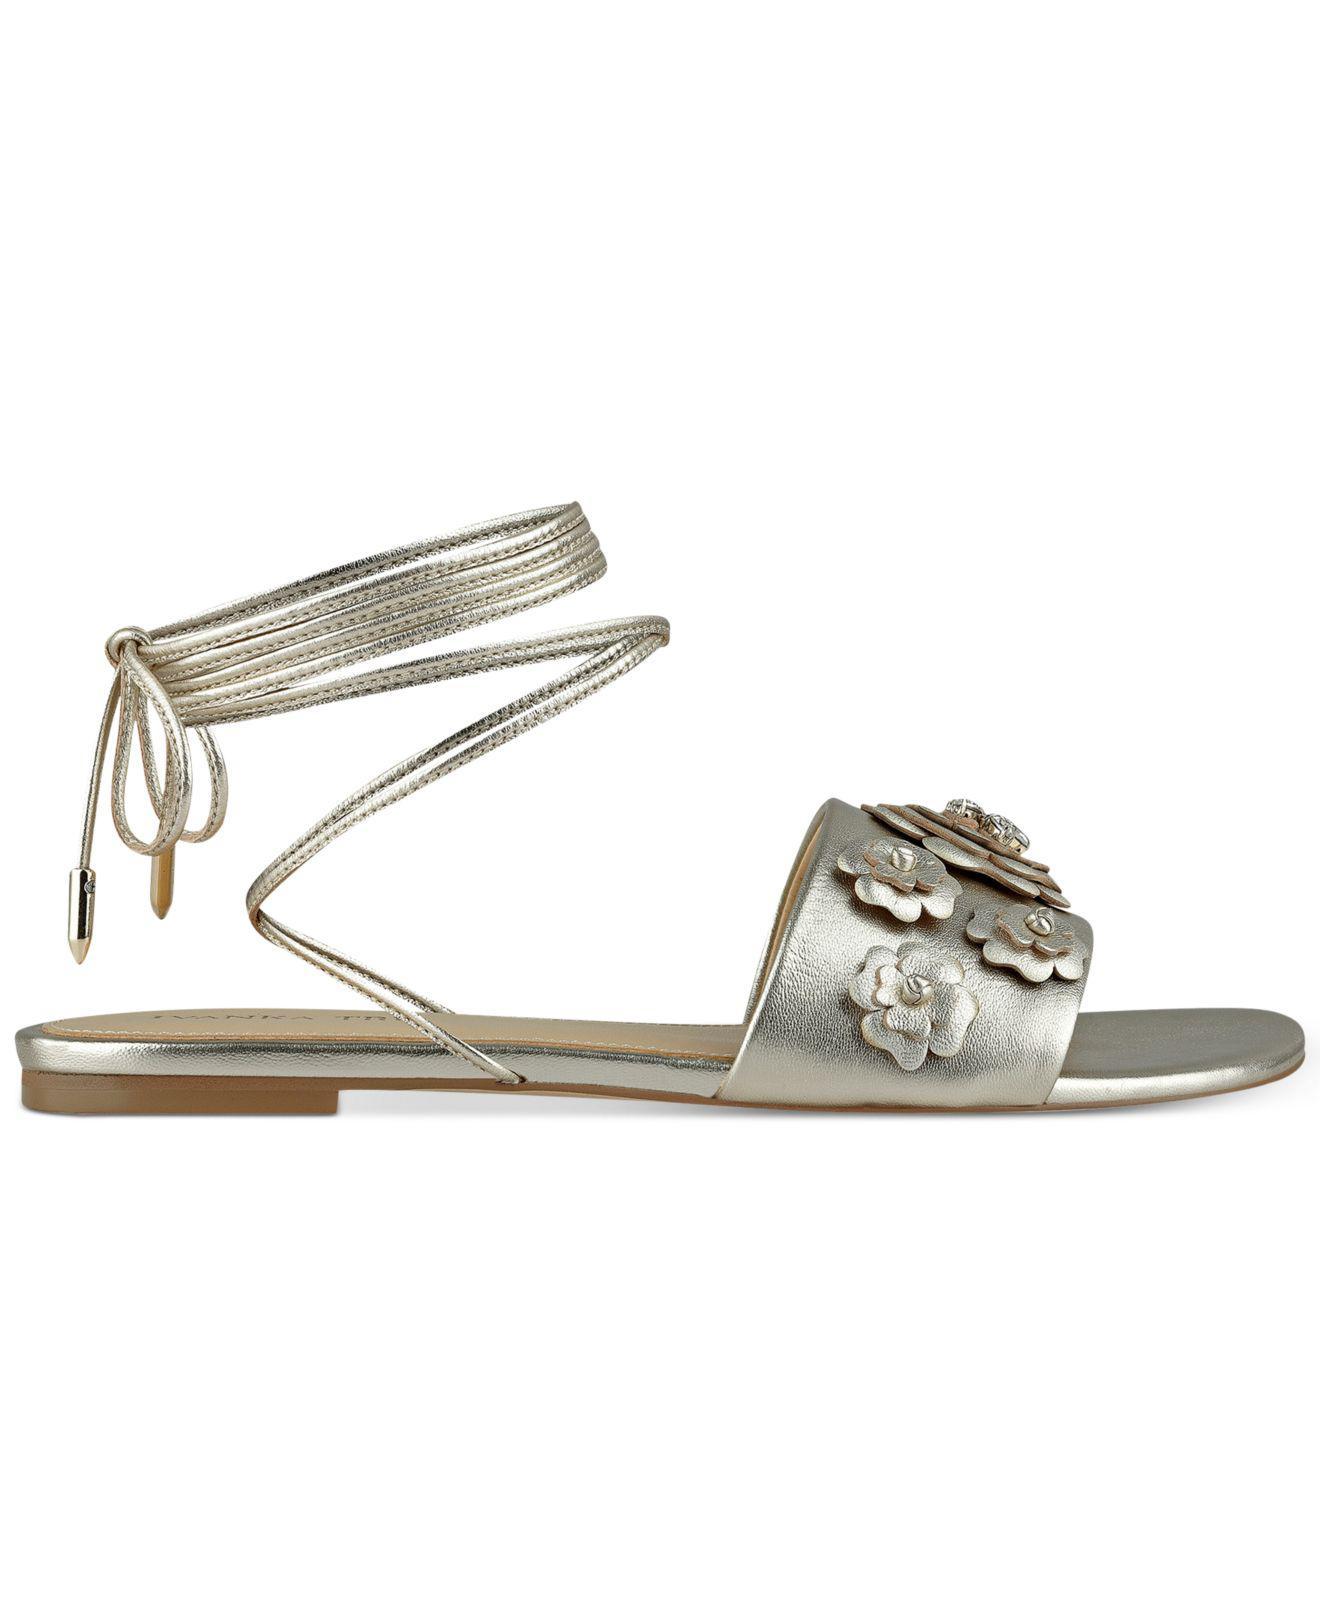 Ivanka Trump Catera Ankle Wrap Sandals AEBhkyC